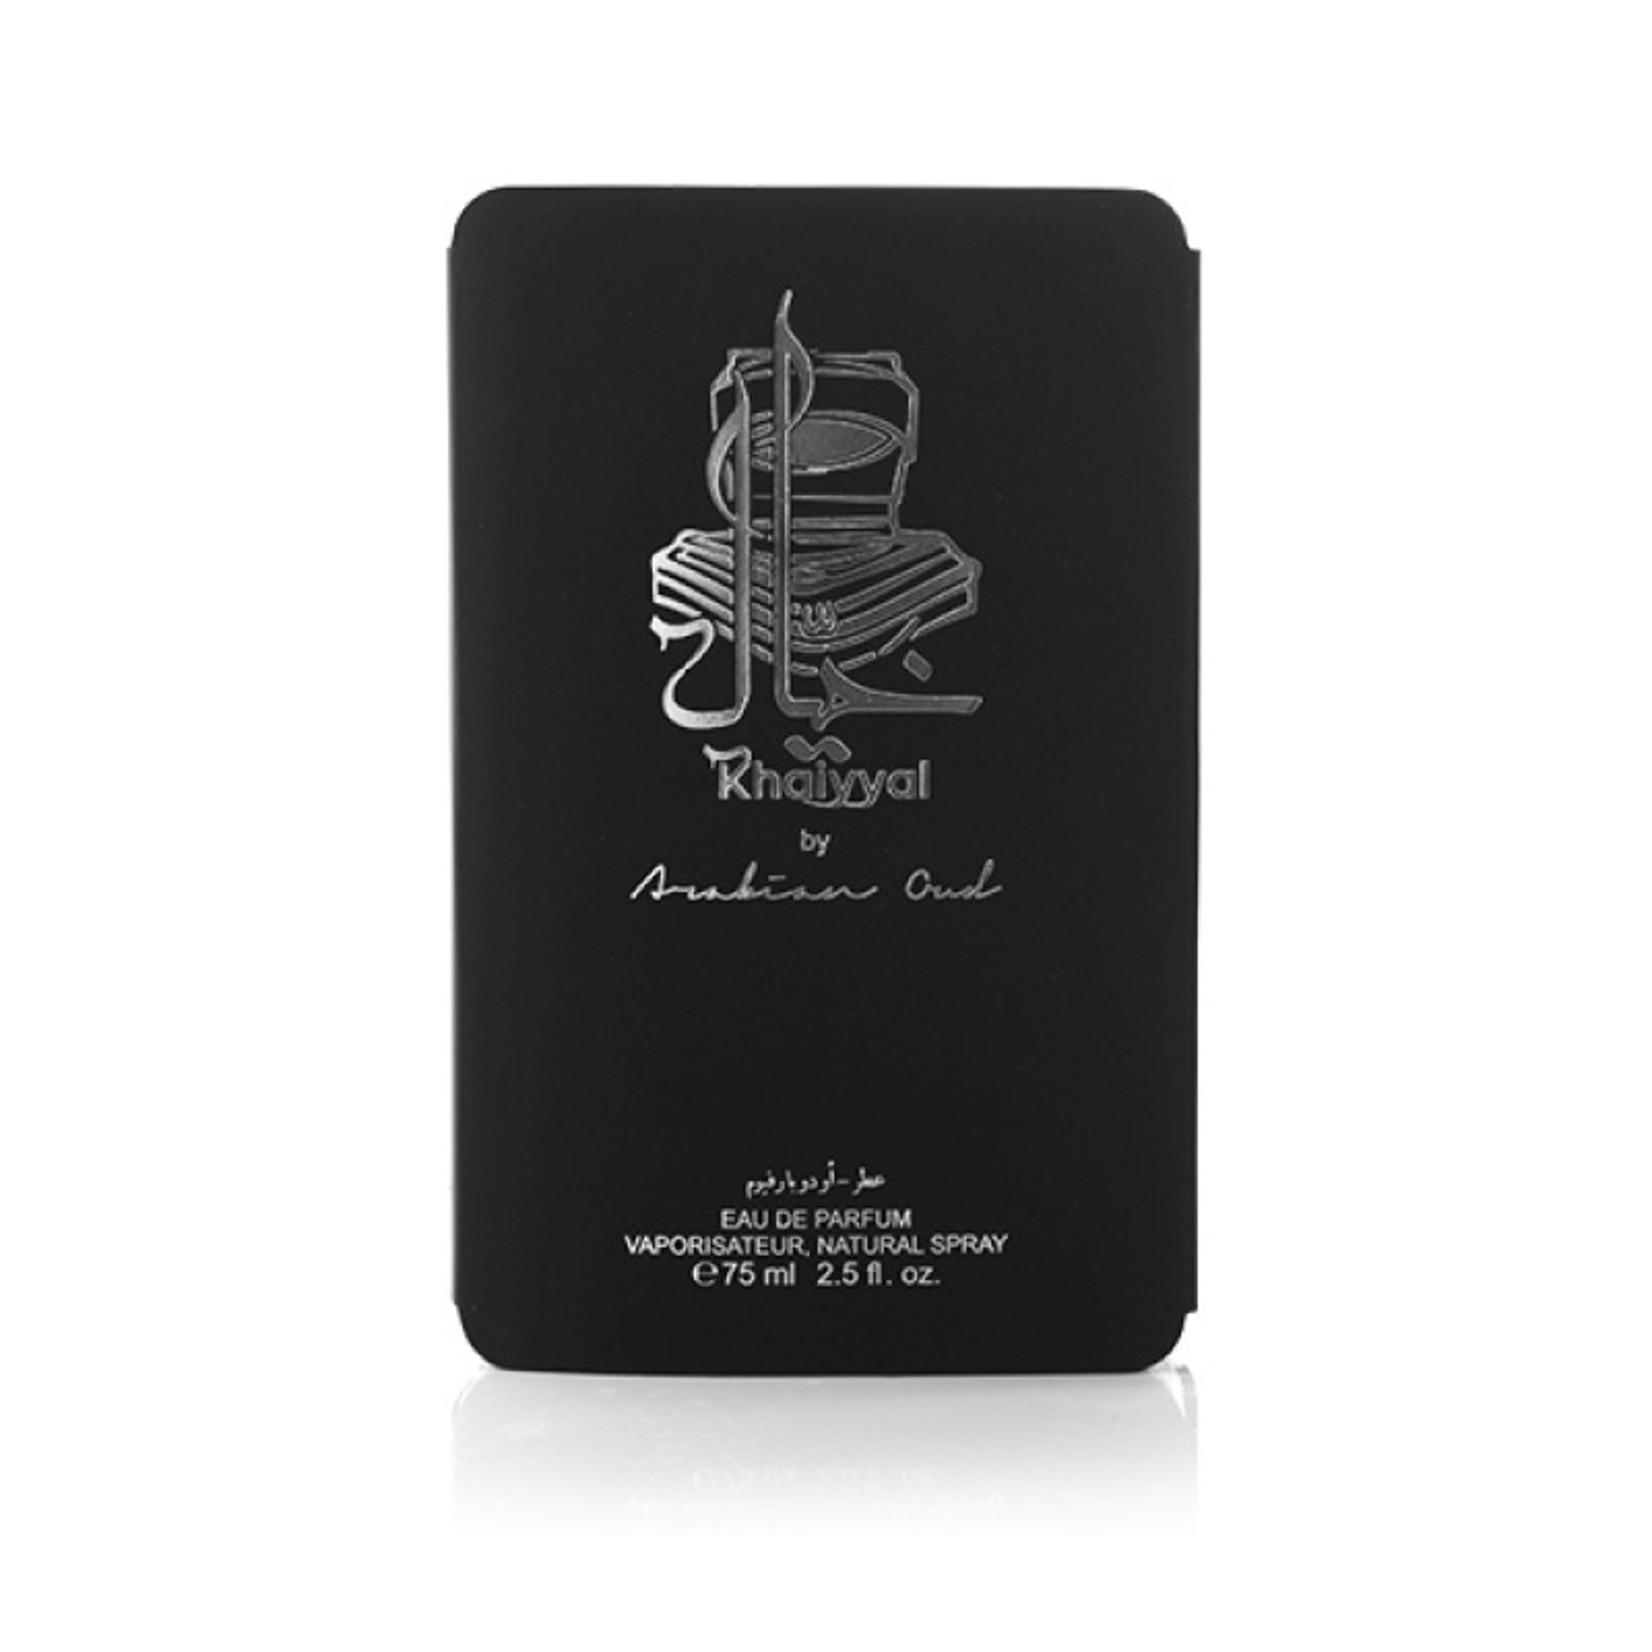 Khaiyyal - 75ML Eau De Parfum